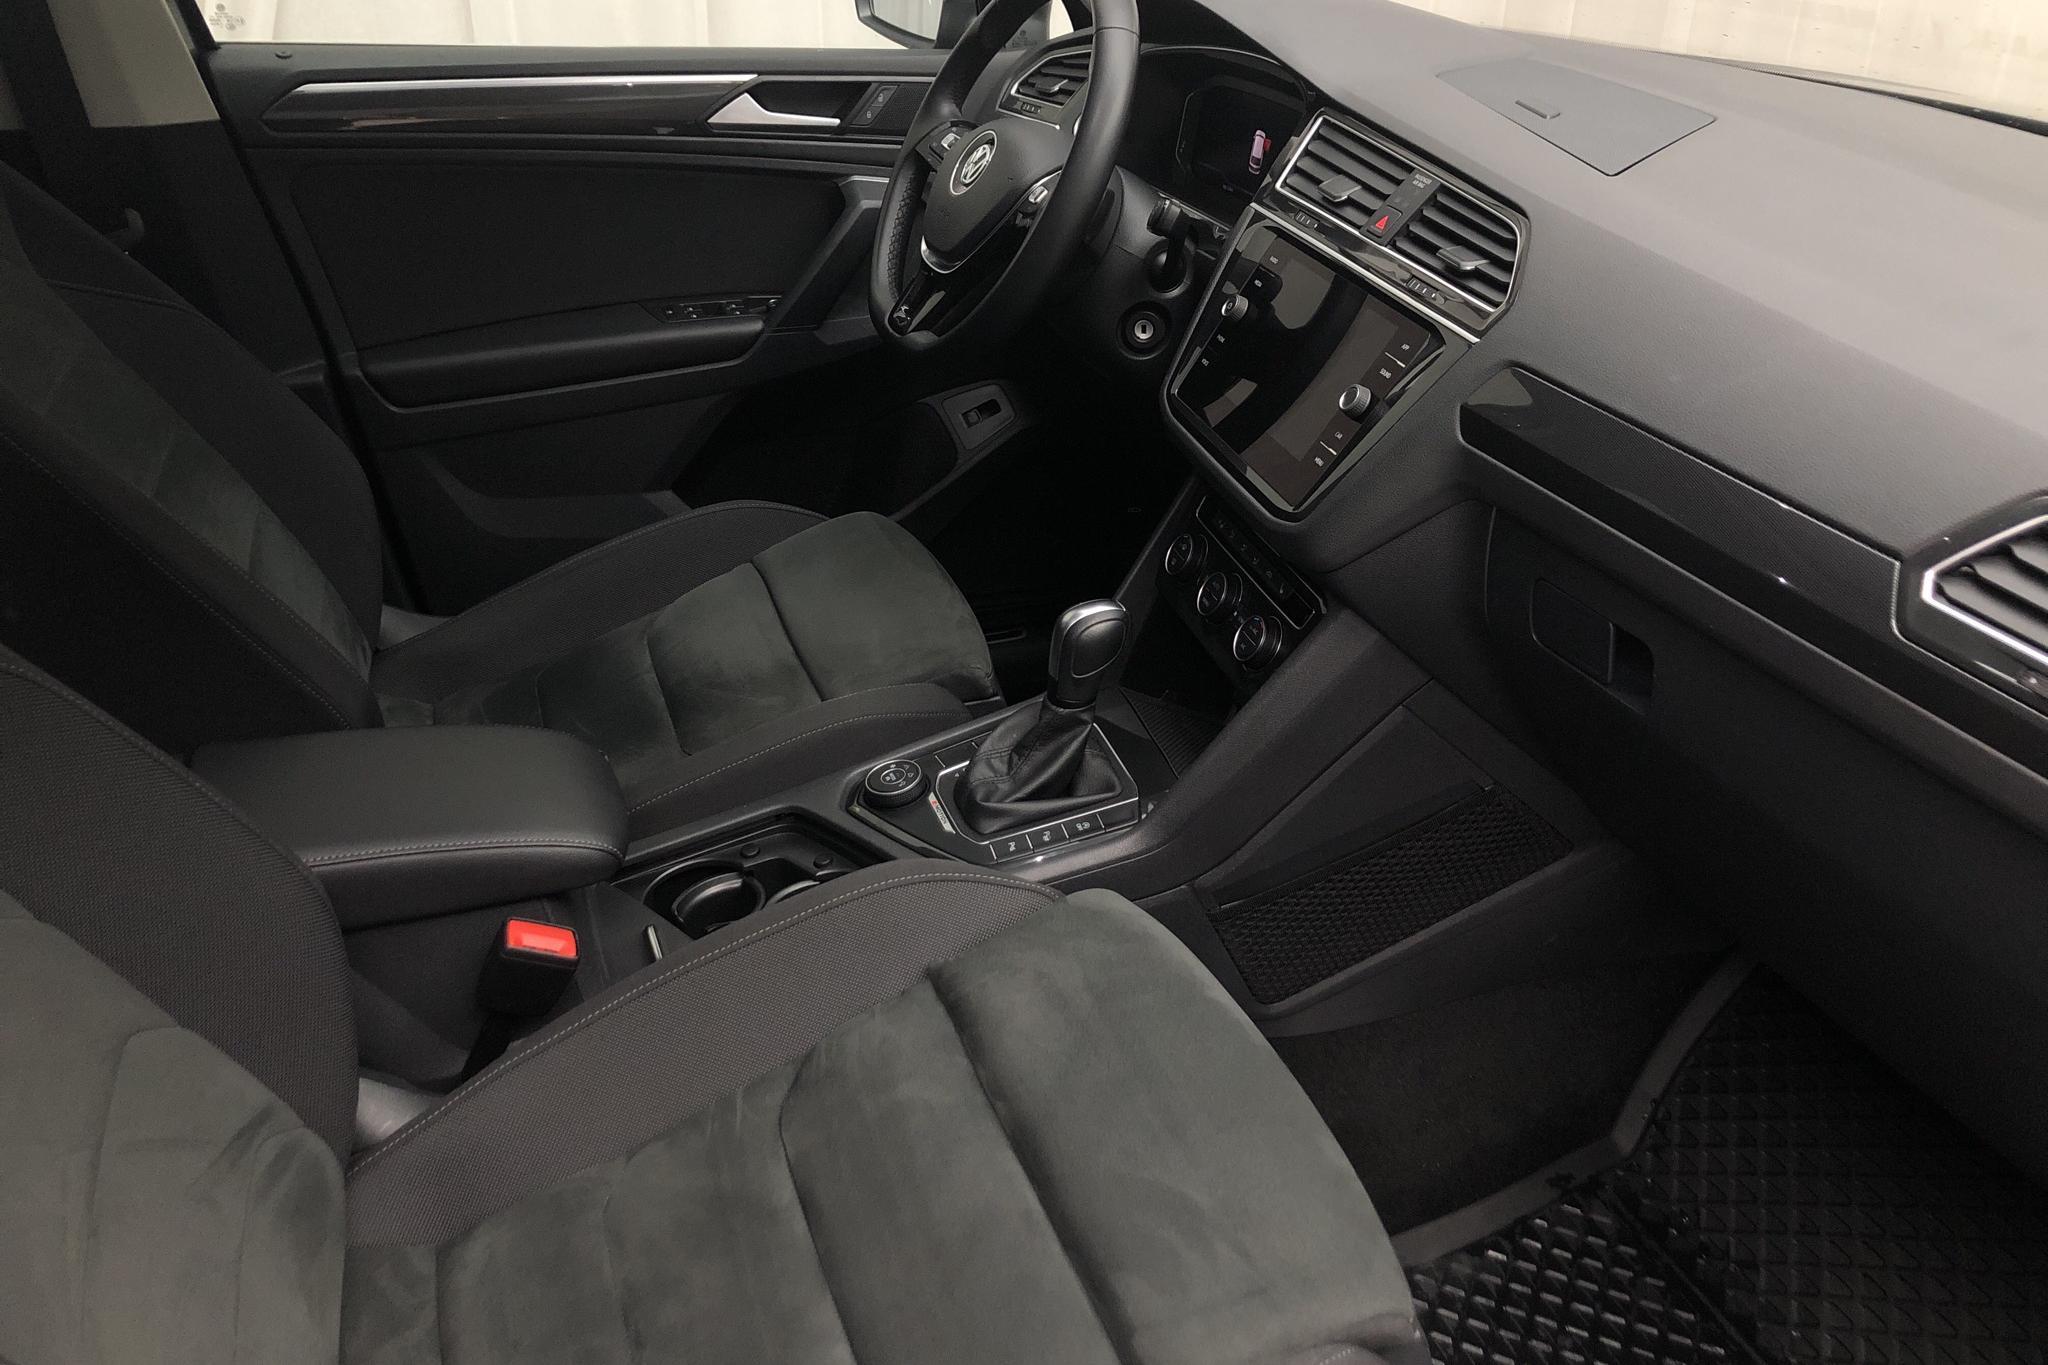 VW Tiguan 2.0 TDI 4MOTION (190hk) - 6 655 mil - Automat - grå - 2020